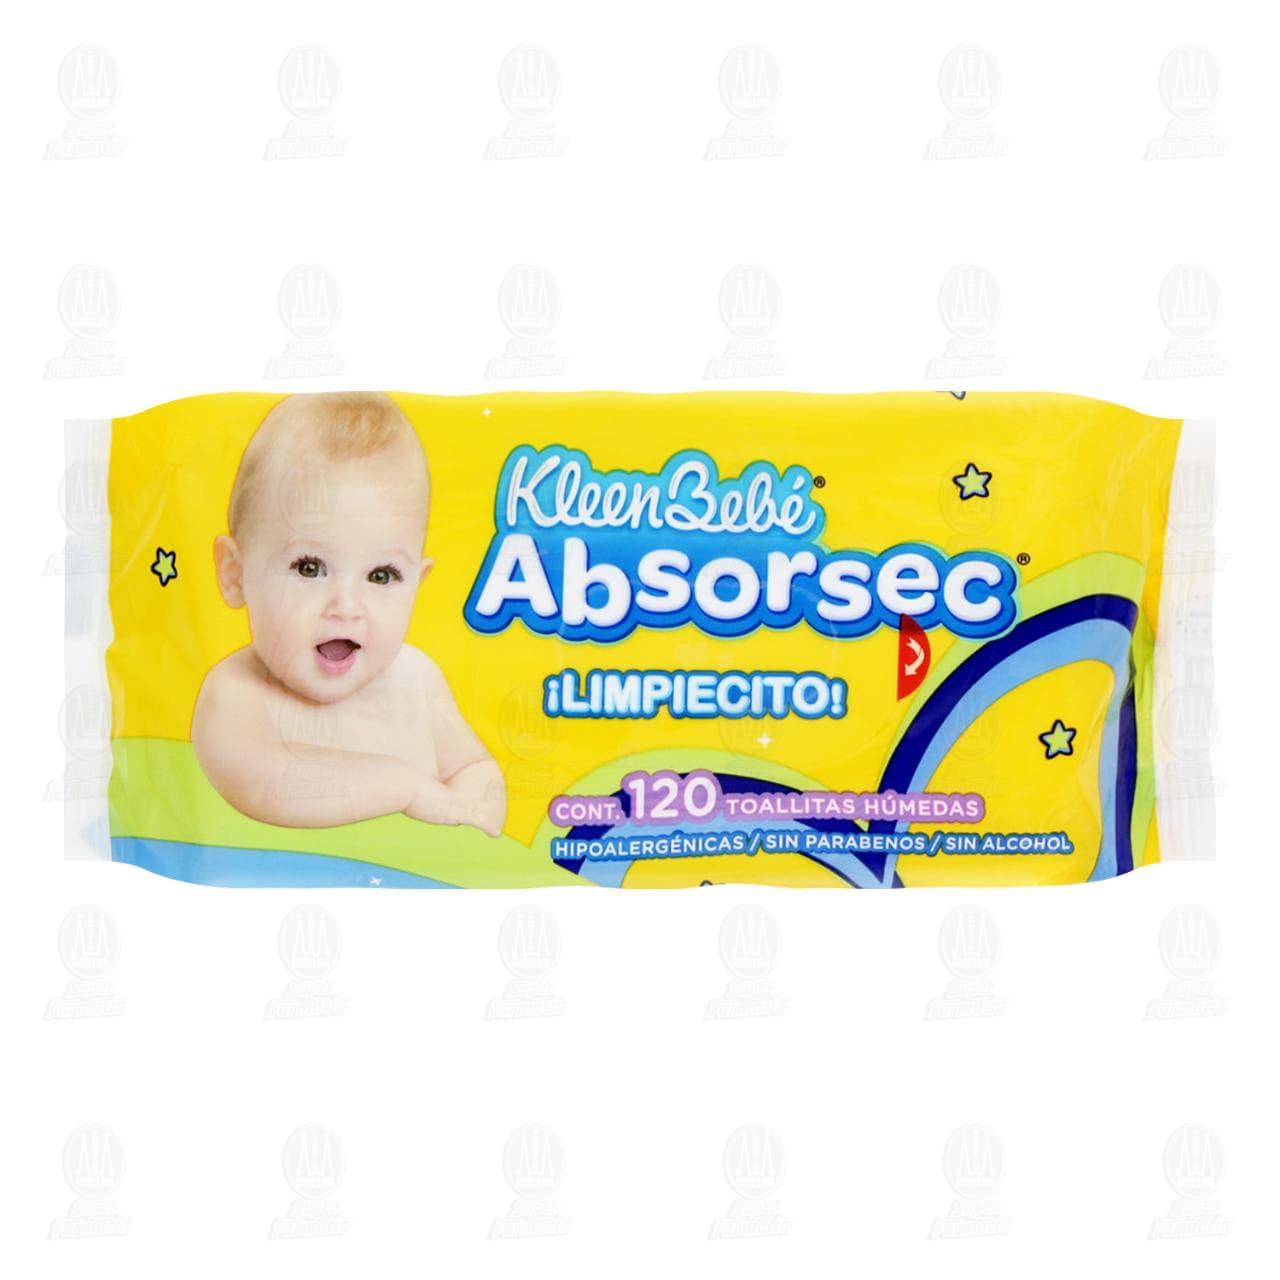 Comprar Toallitas para Bebé KleenBebé Absorsec, 120 pzas. en Farmacias Guadalajara